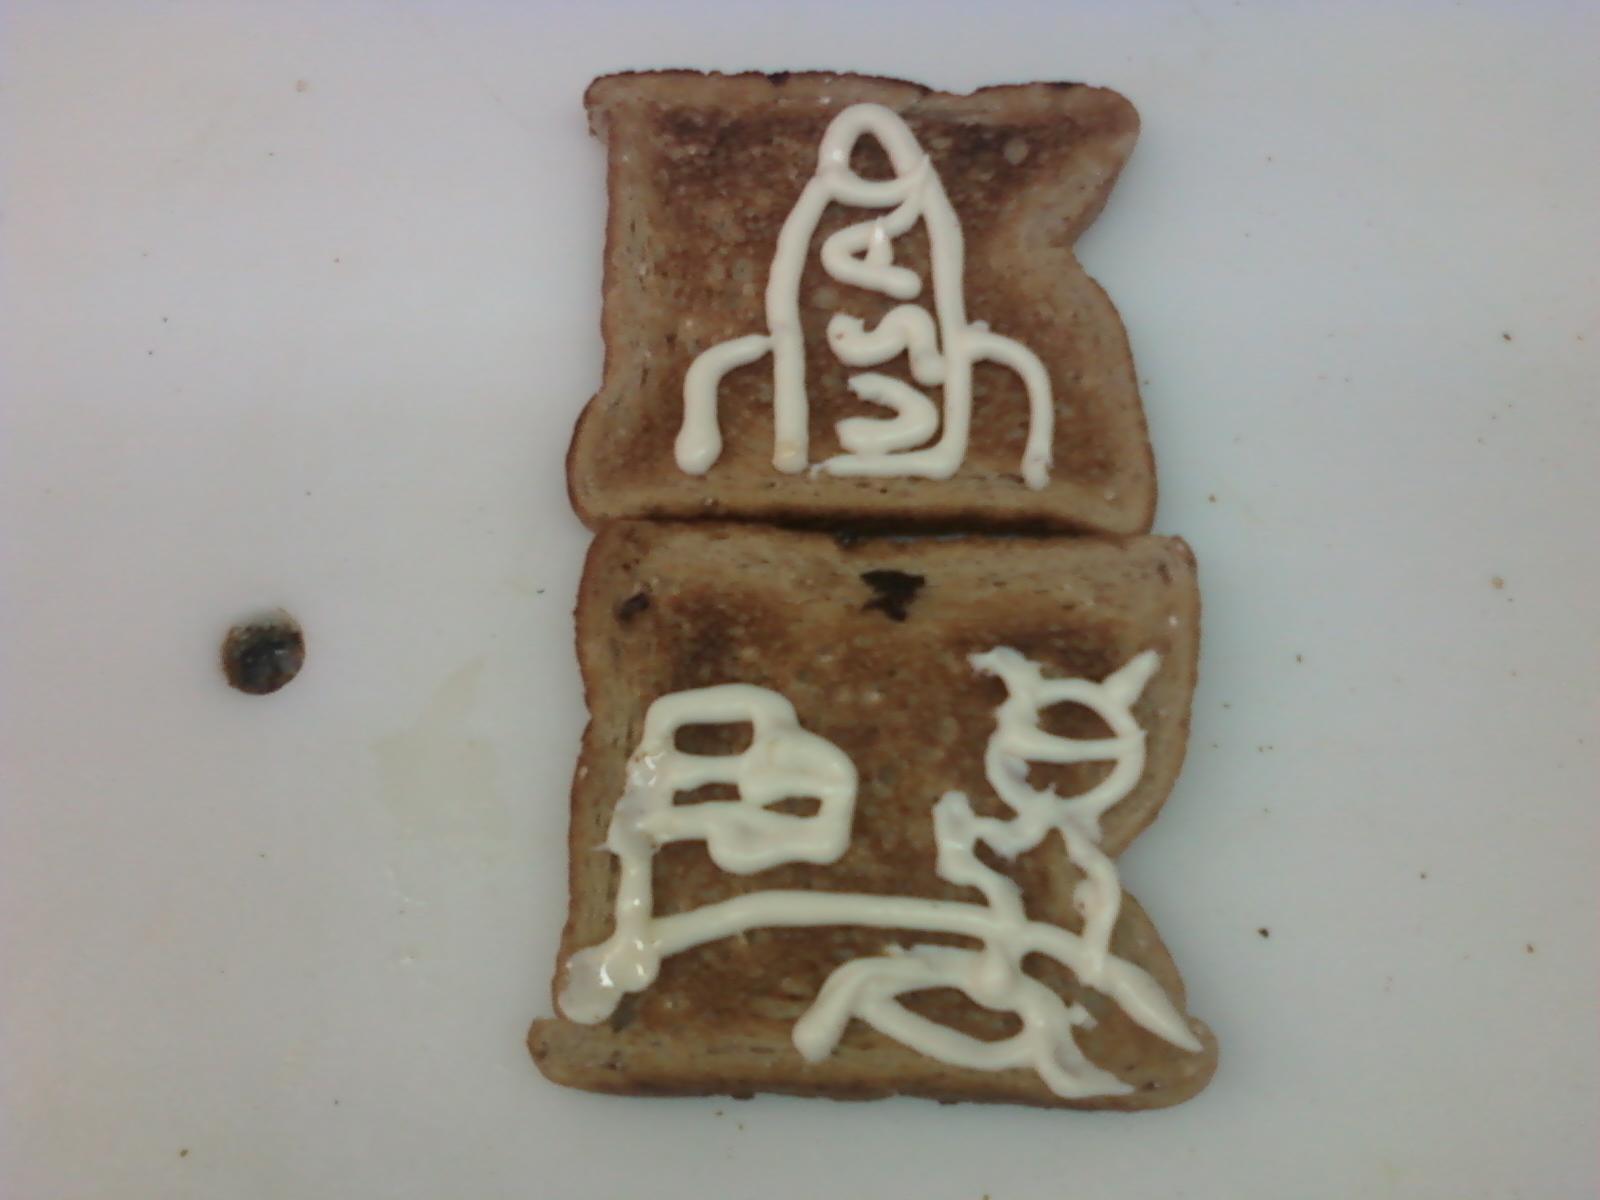 sandwich_art/0618110850.jpg